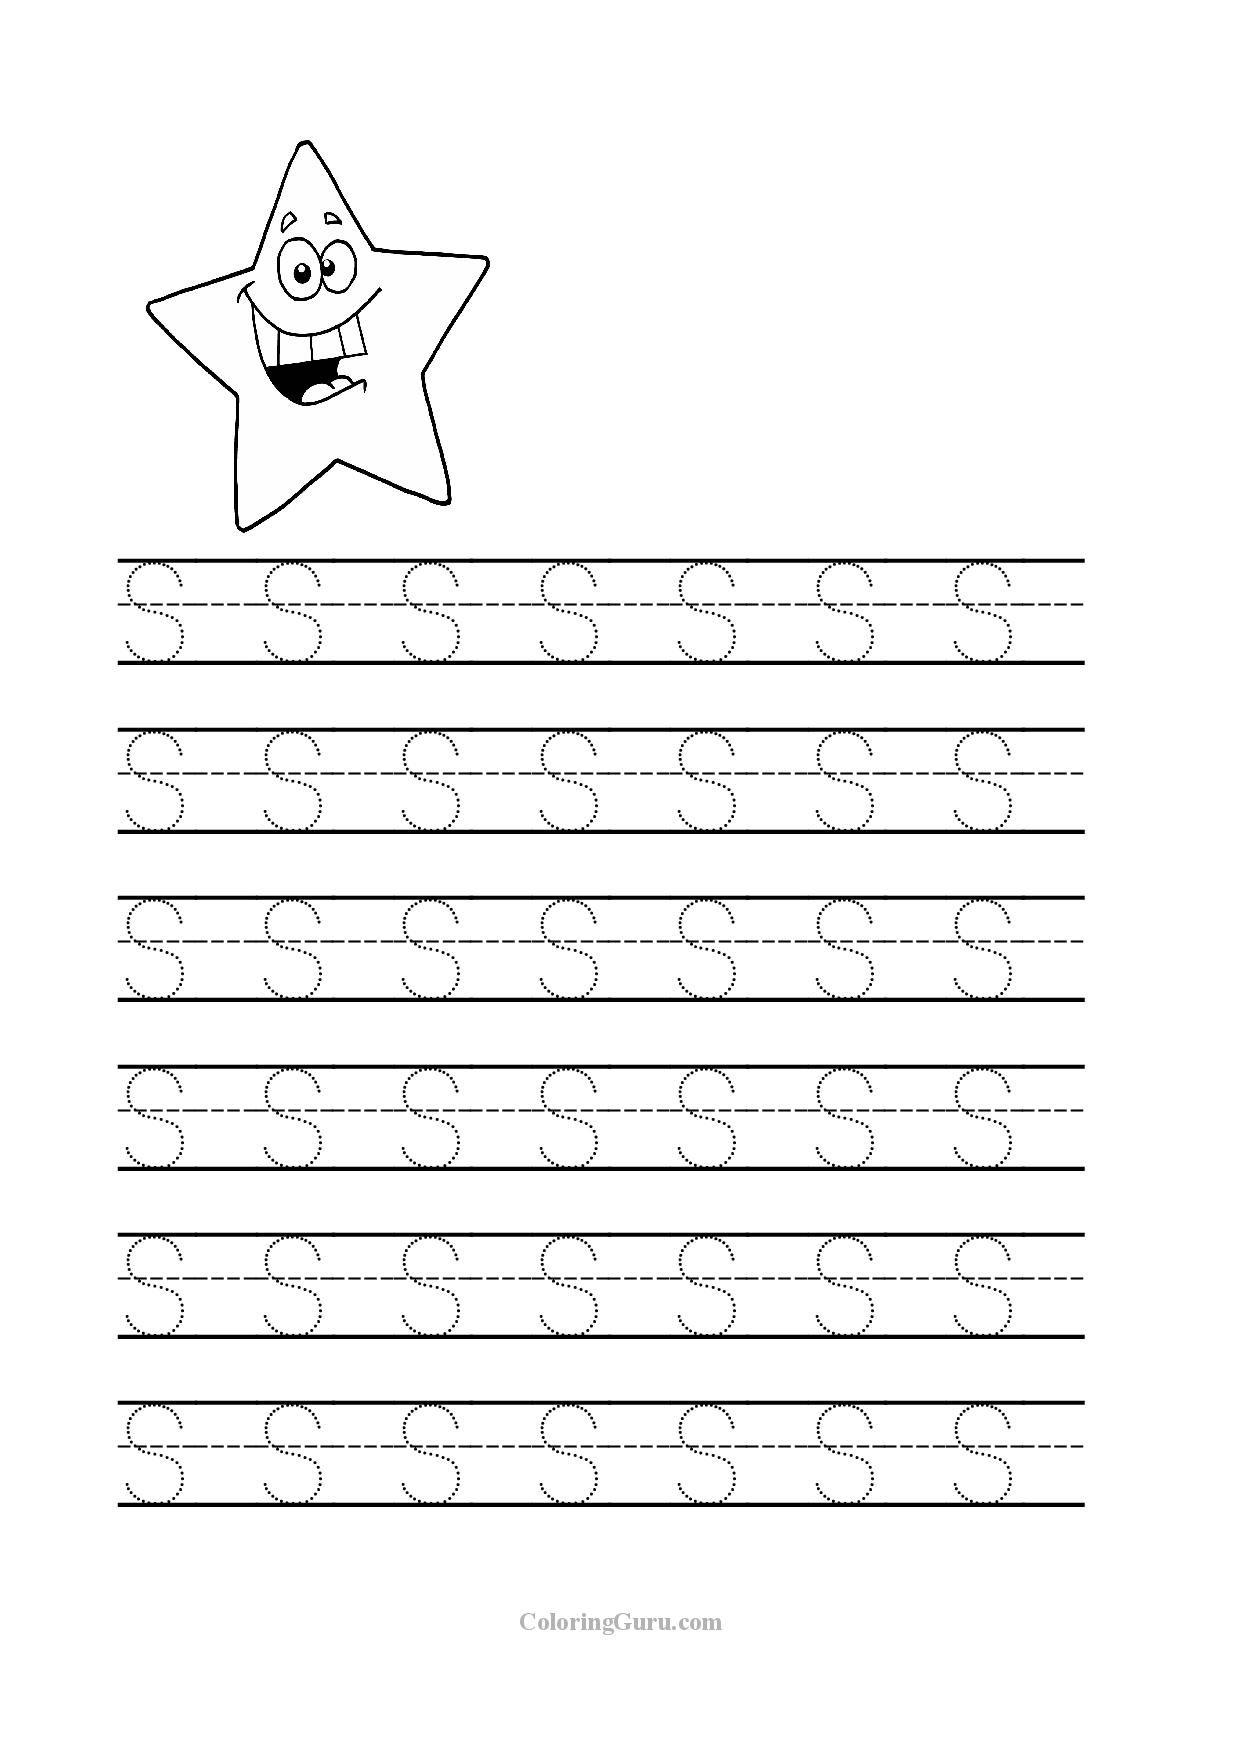 Tracing Letters Kindergarten Sheets